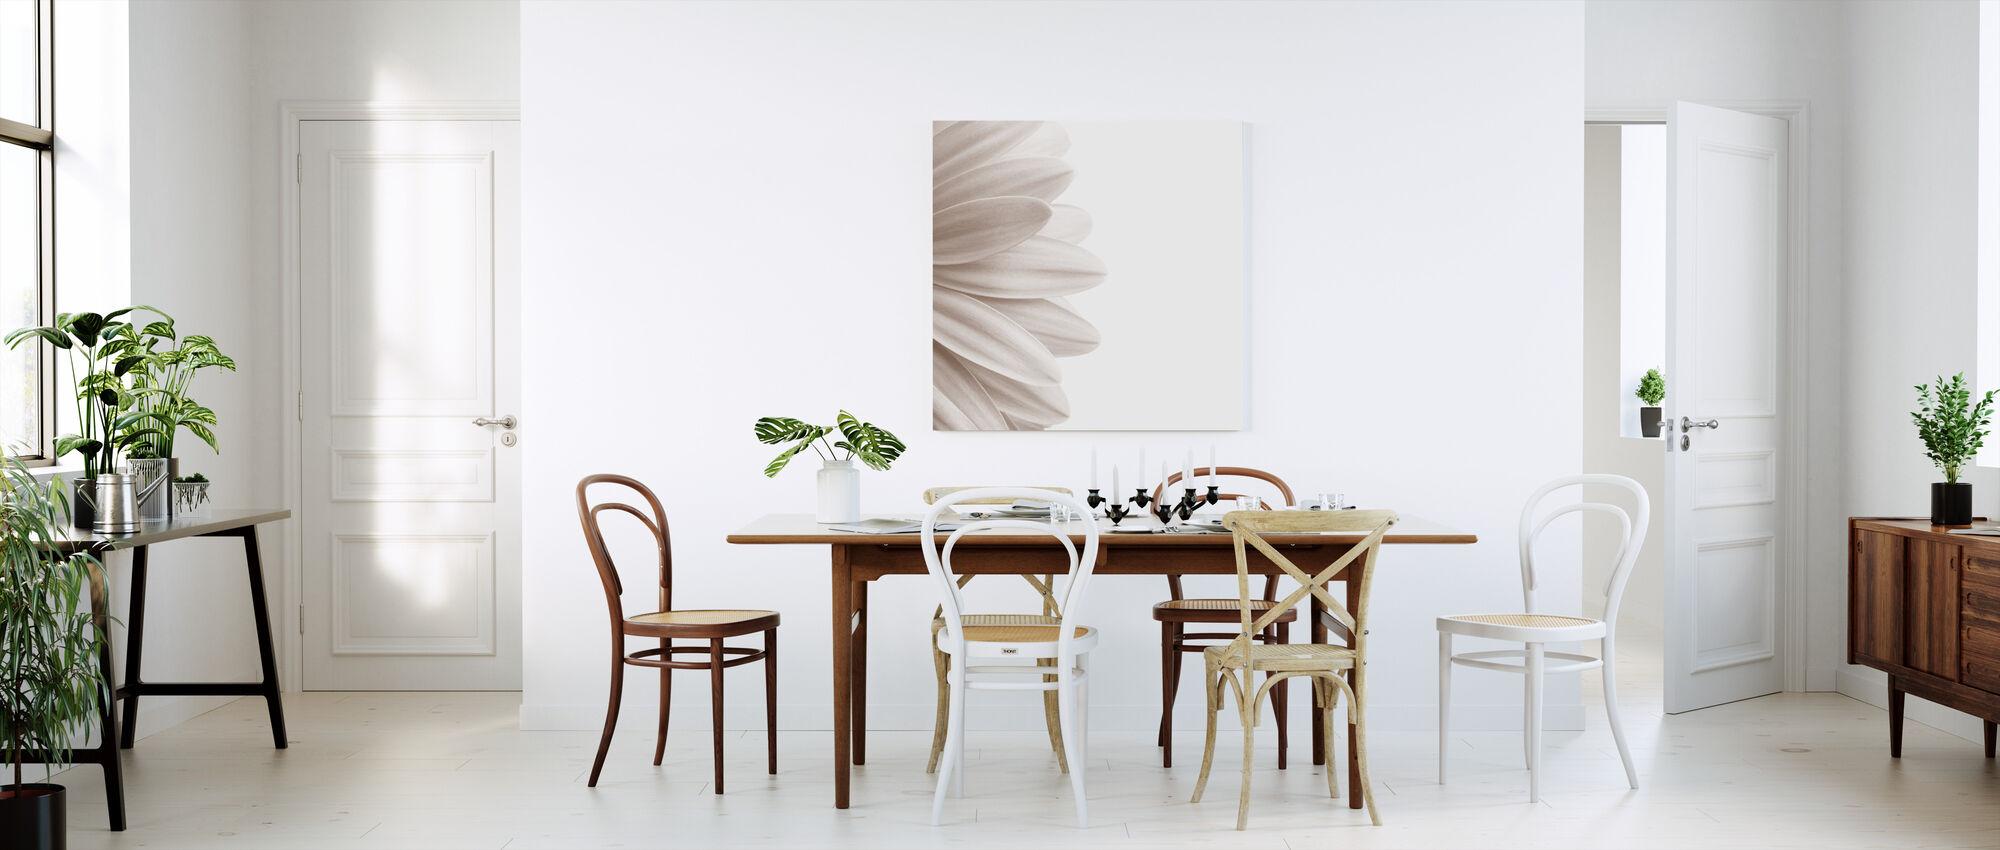 Pink Petal - Sepia - Canvas print - Kitchen